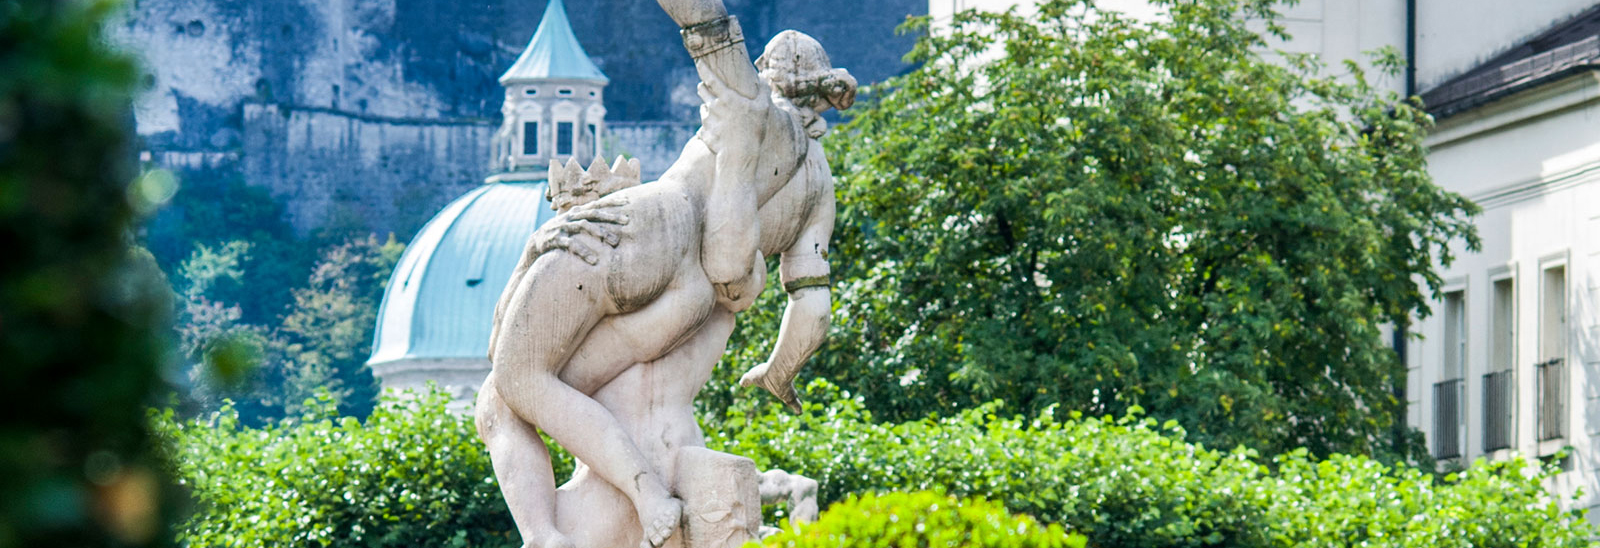 Salzburg Guide Tourismus - Stadtblick